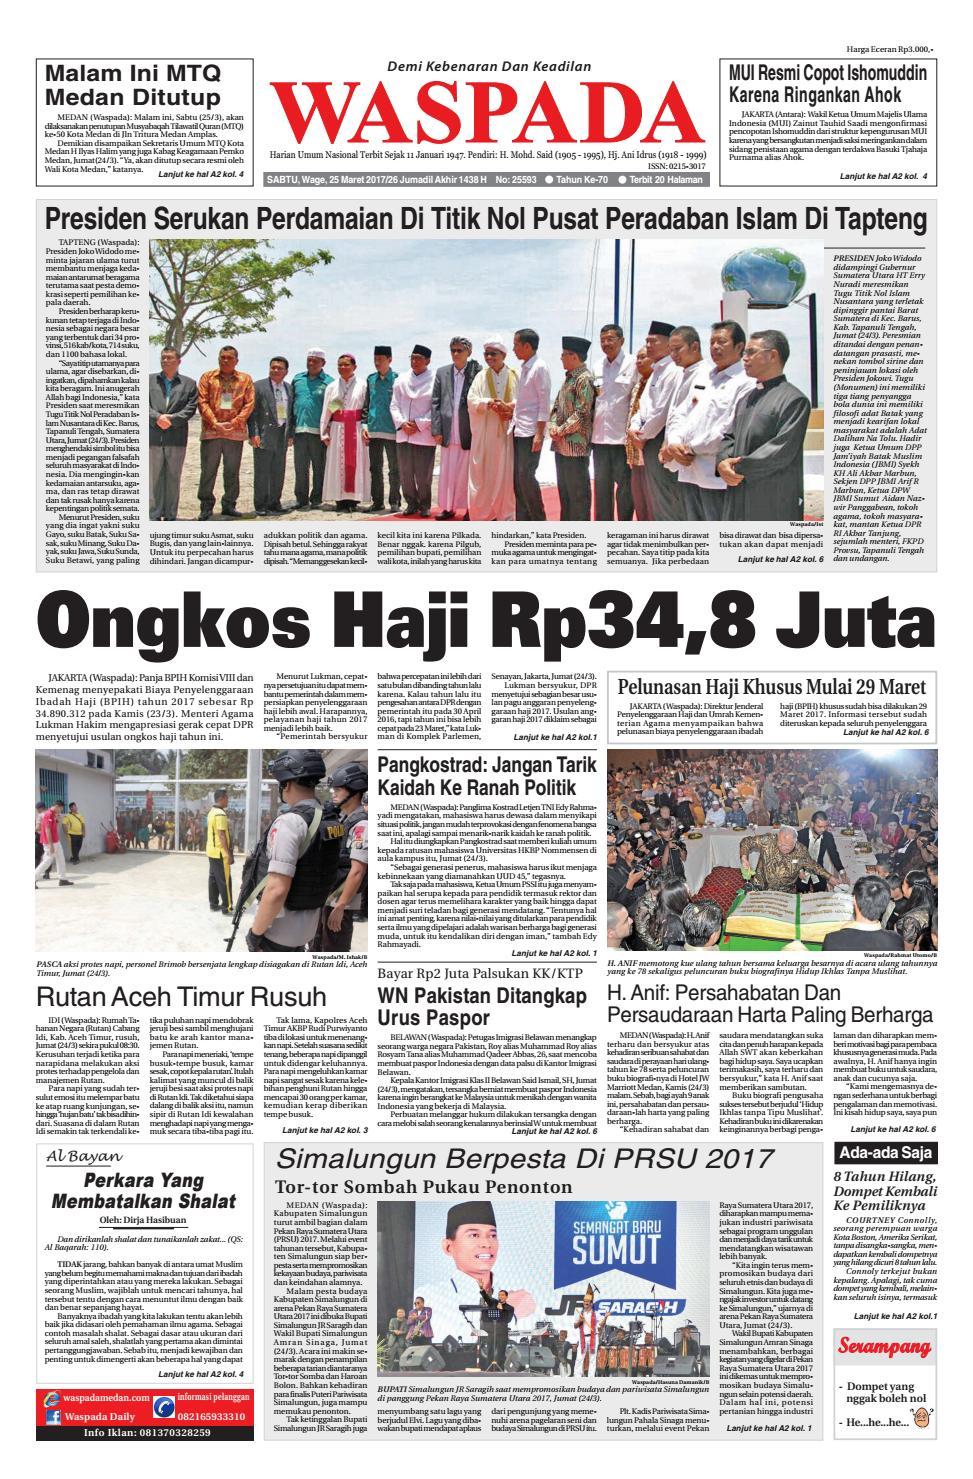 Waspada Sabtu 25 Maret 2017 By Harian Issuu Produk Ukm Bumn Tas Phiton Kombinasi Coklat Krem